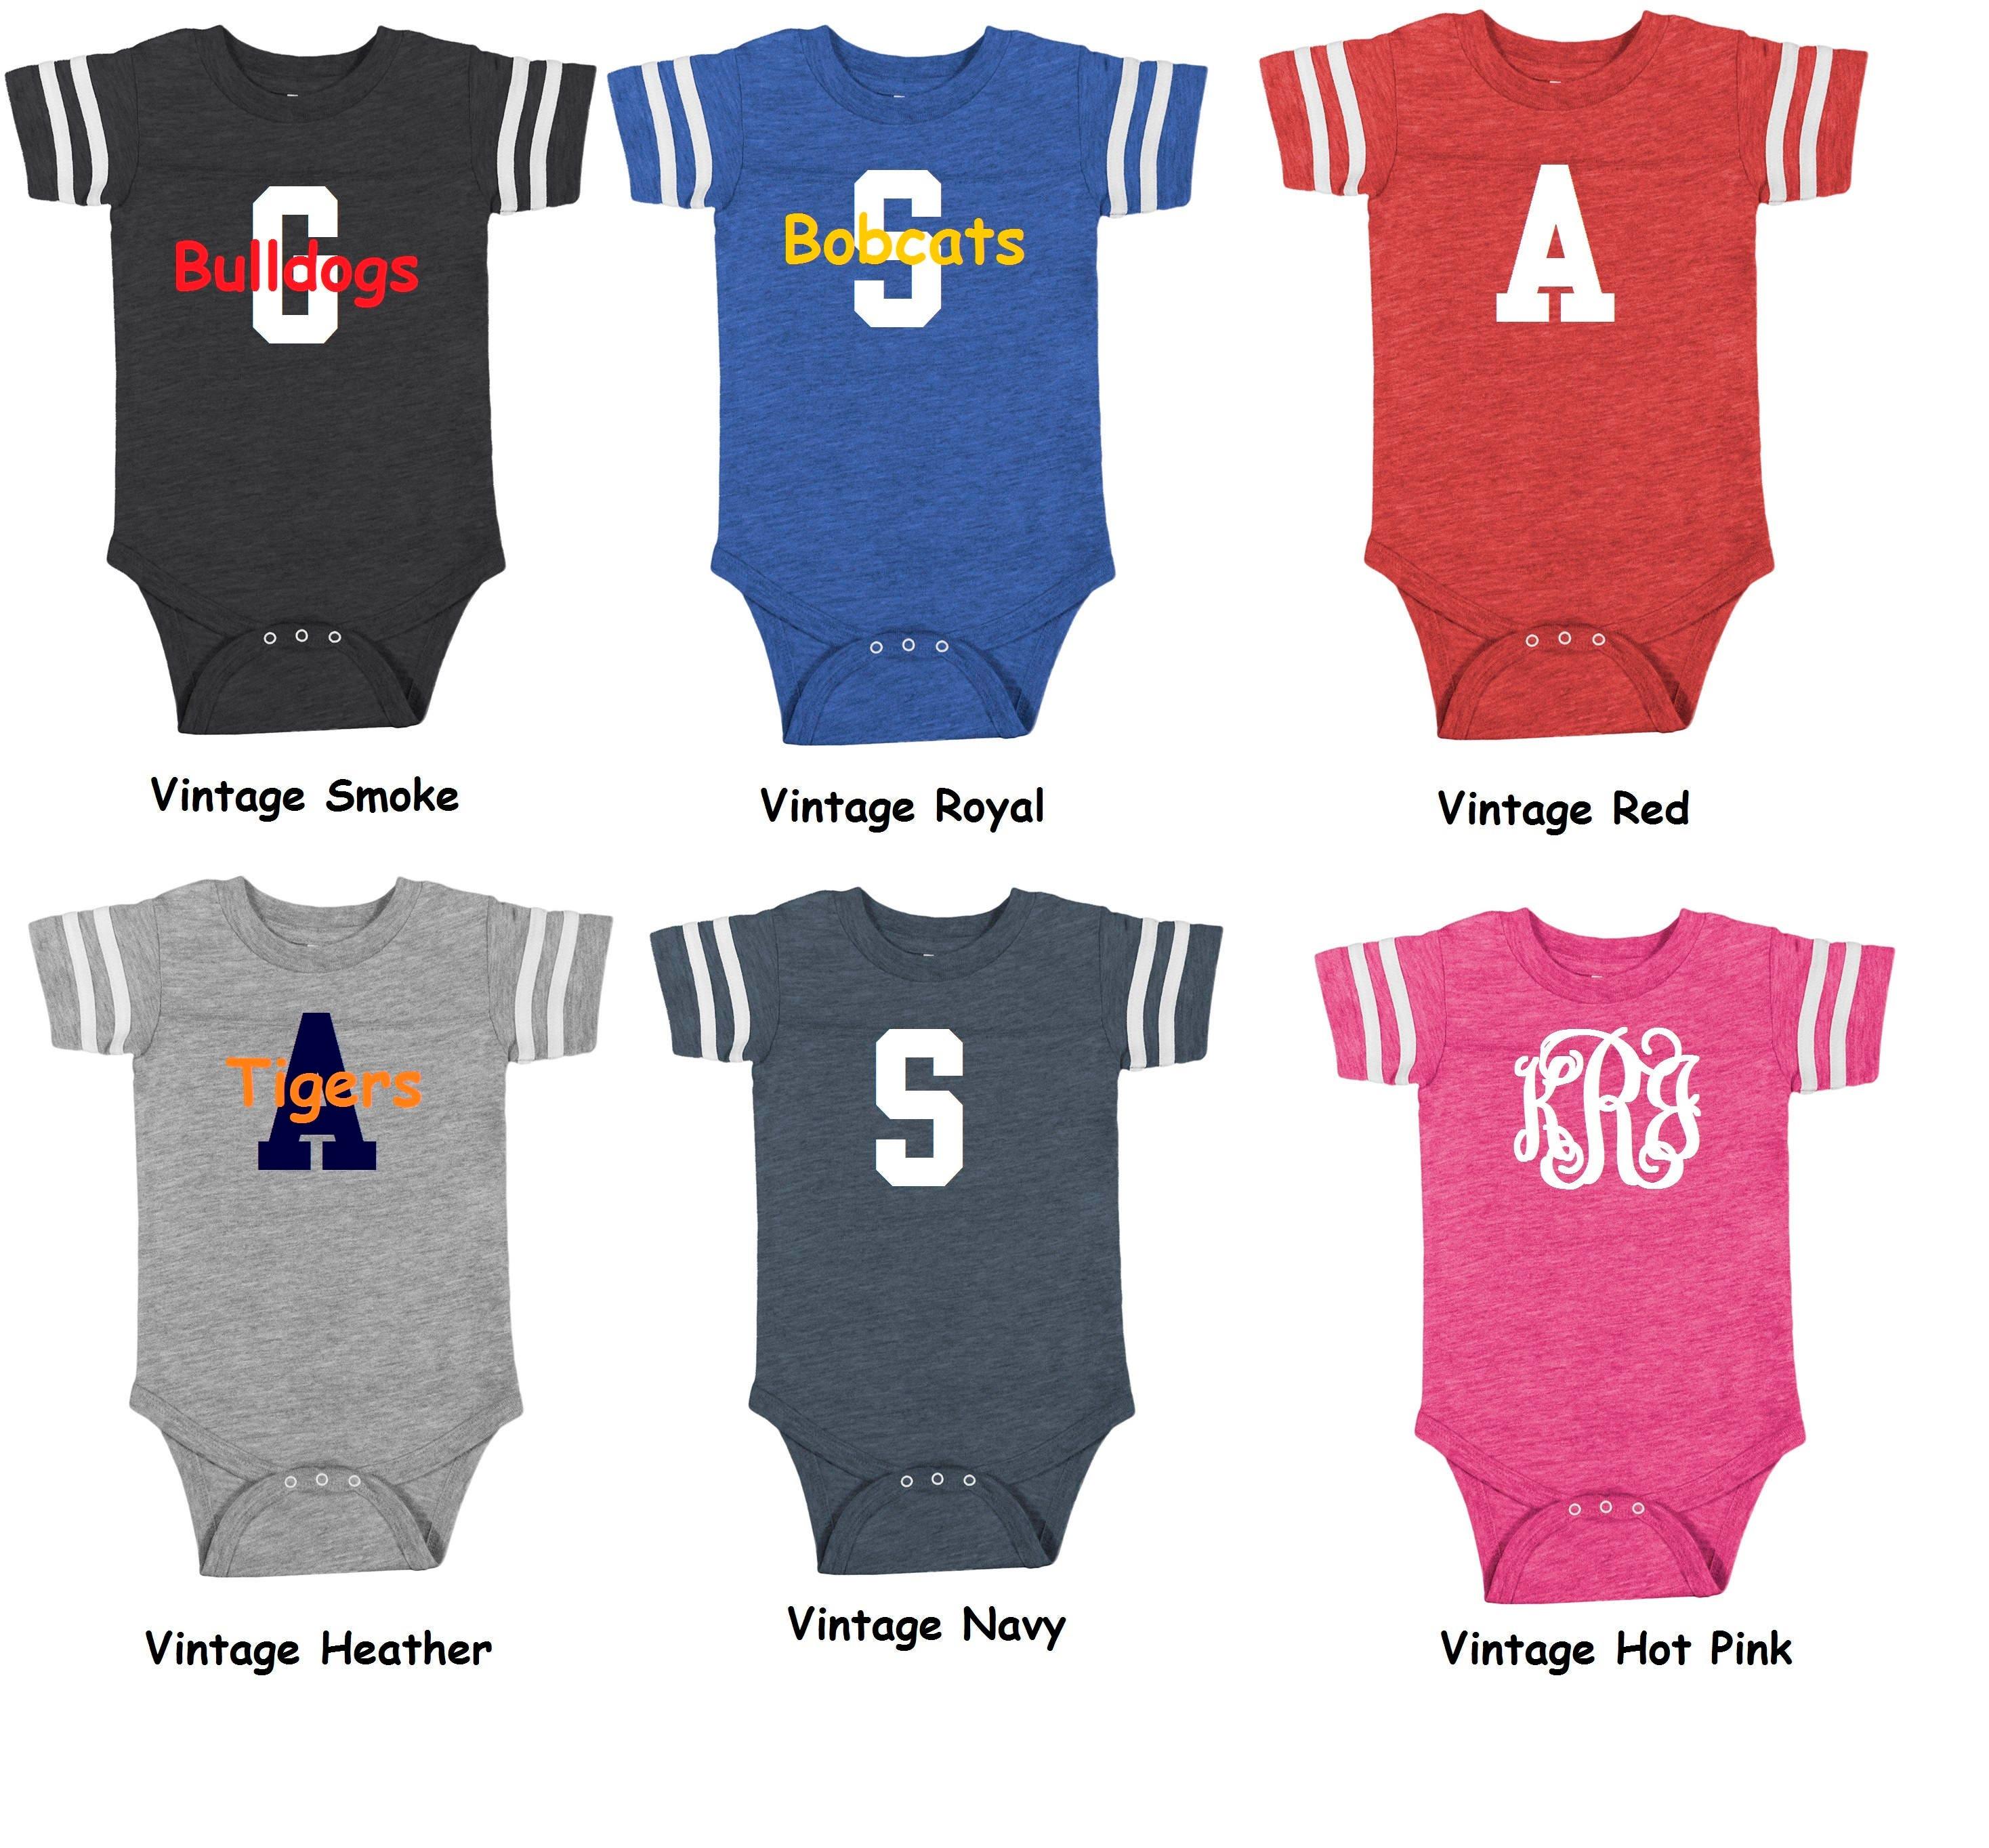 8e29a5a59a4 Monogrammed Infant Football Jersey Bodysuit/Infant Jersey/Infant Football  Shirt/Football Jersey/Football Onesie/Baby Shower Gift